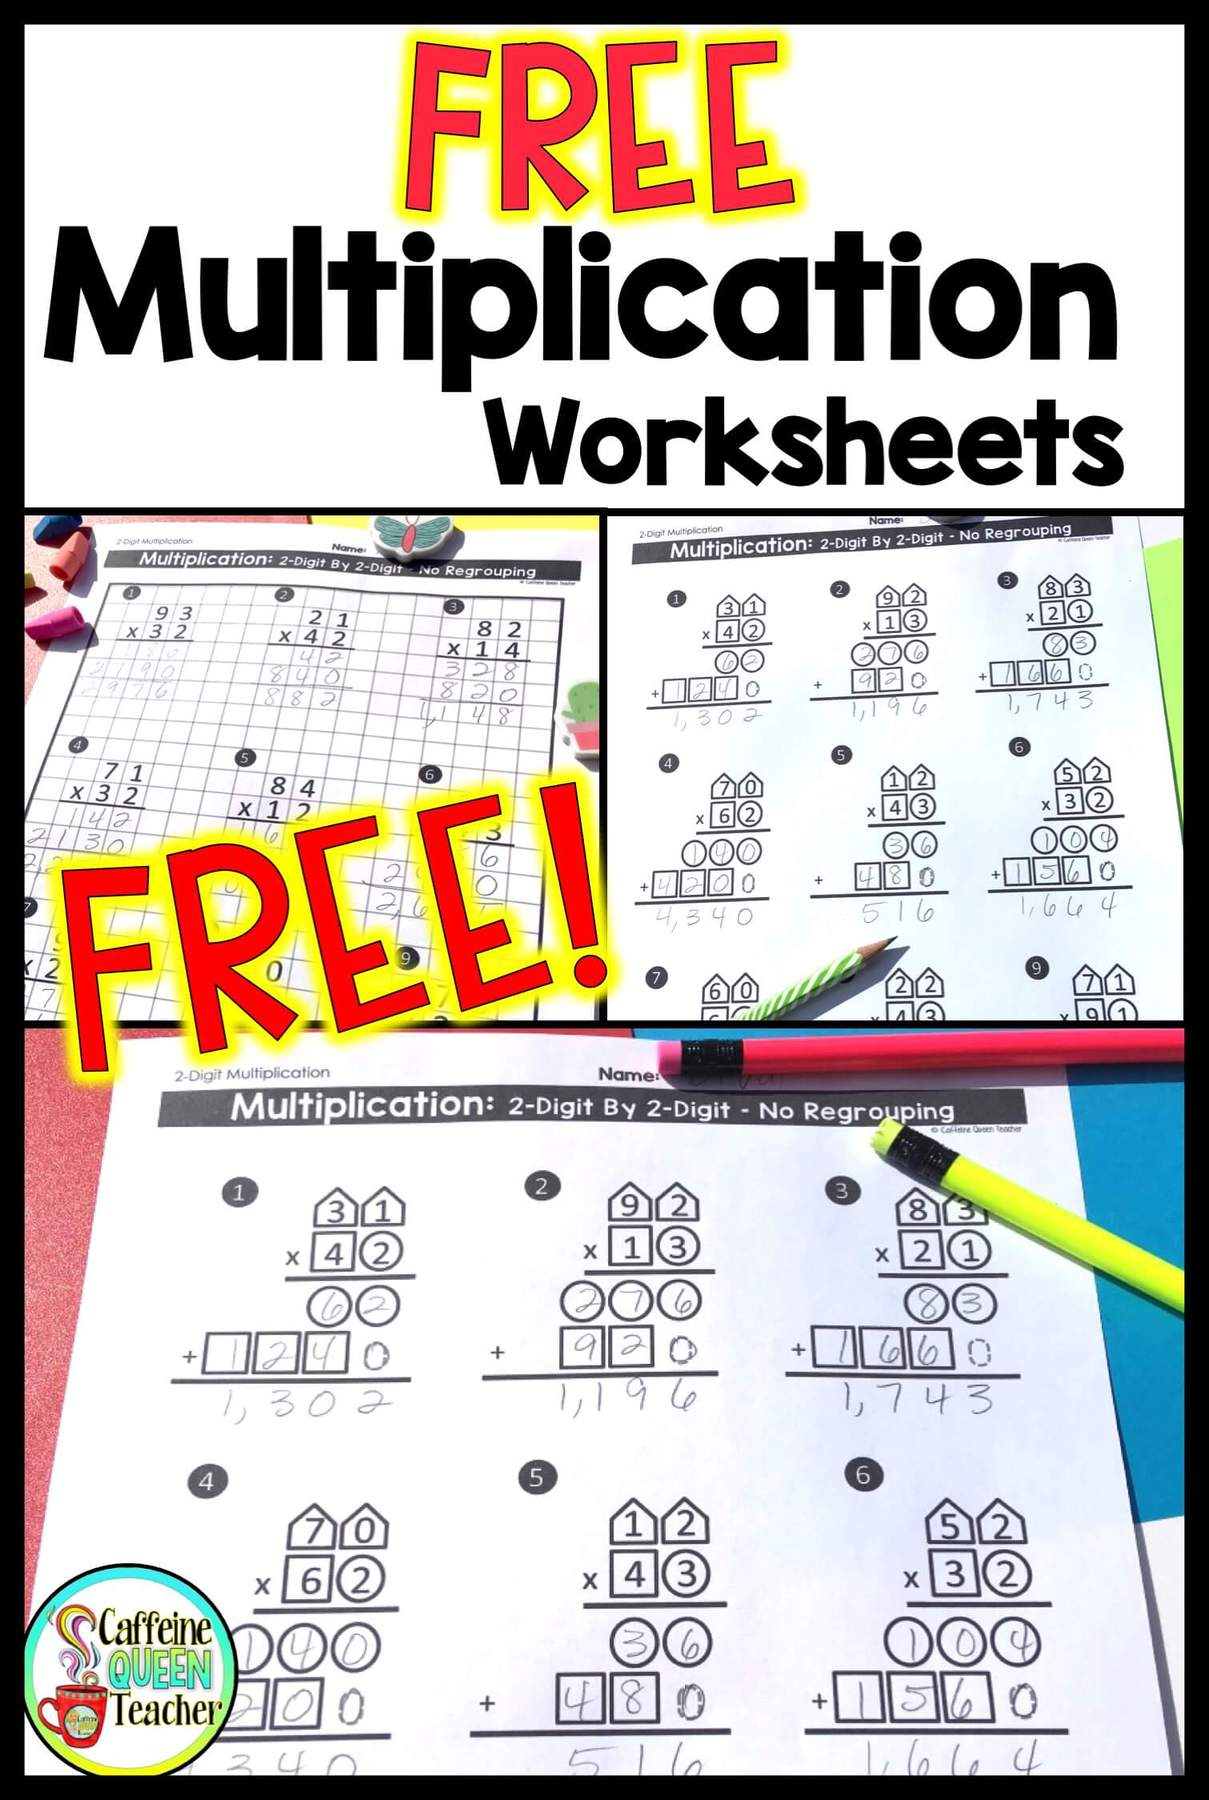 hight resolution of 2-Digit Multiplication Worksheets: Differentiated - Caffeine Queen Teacher